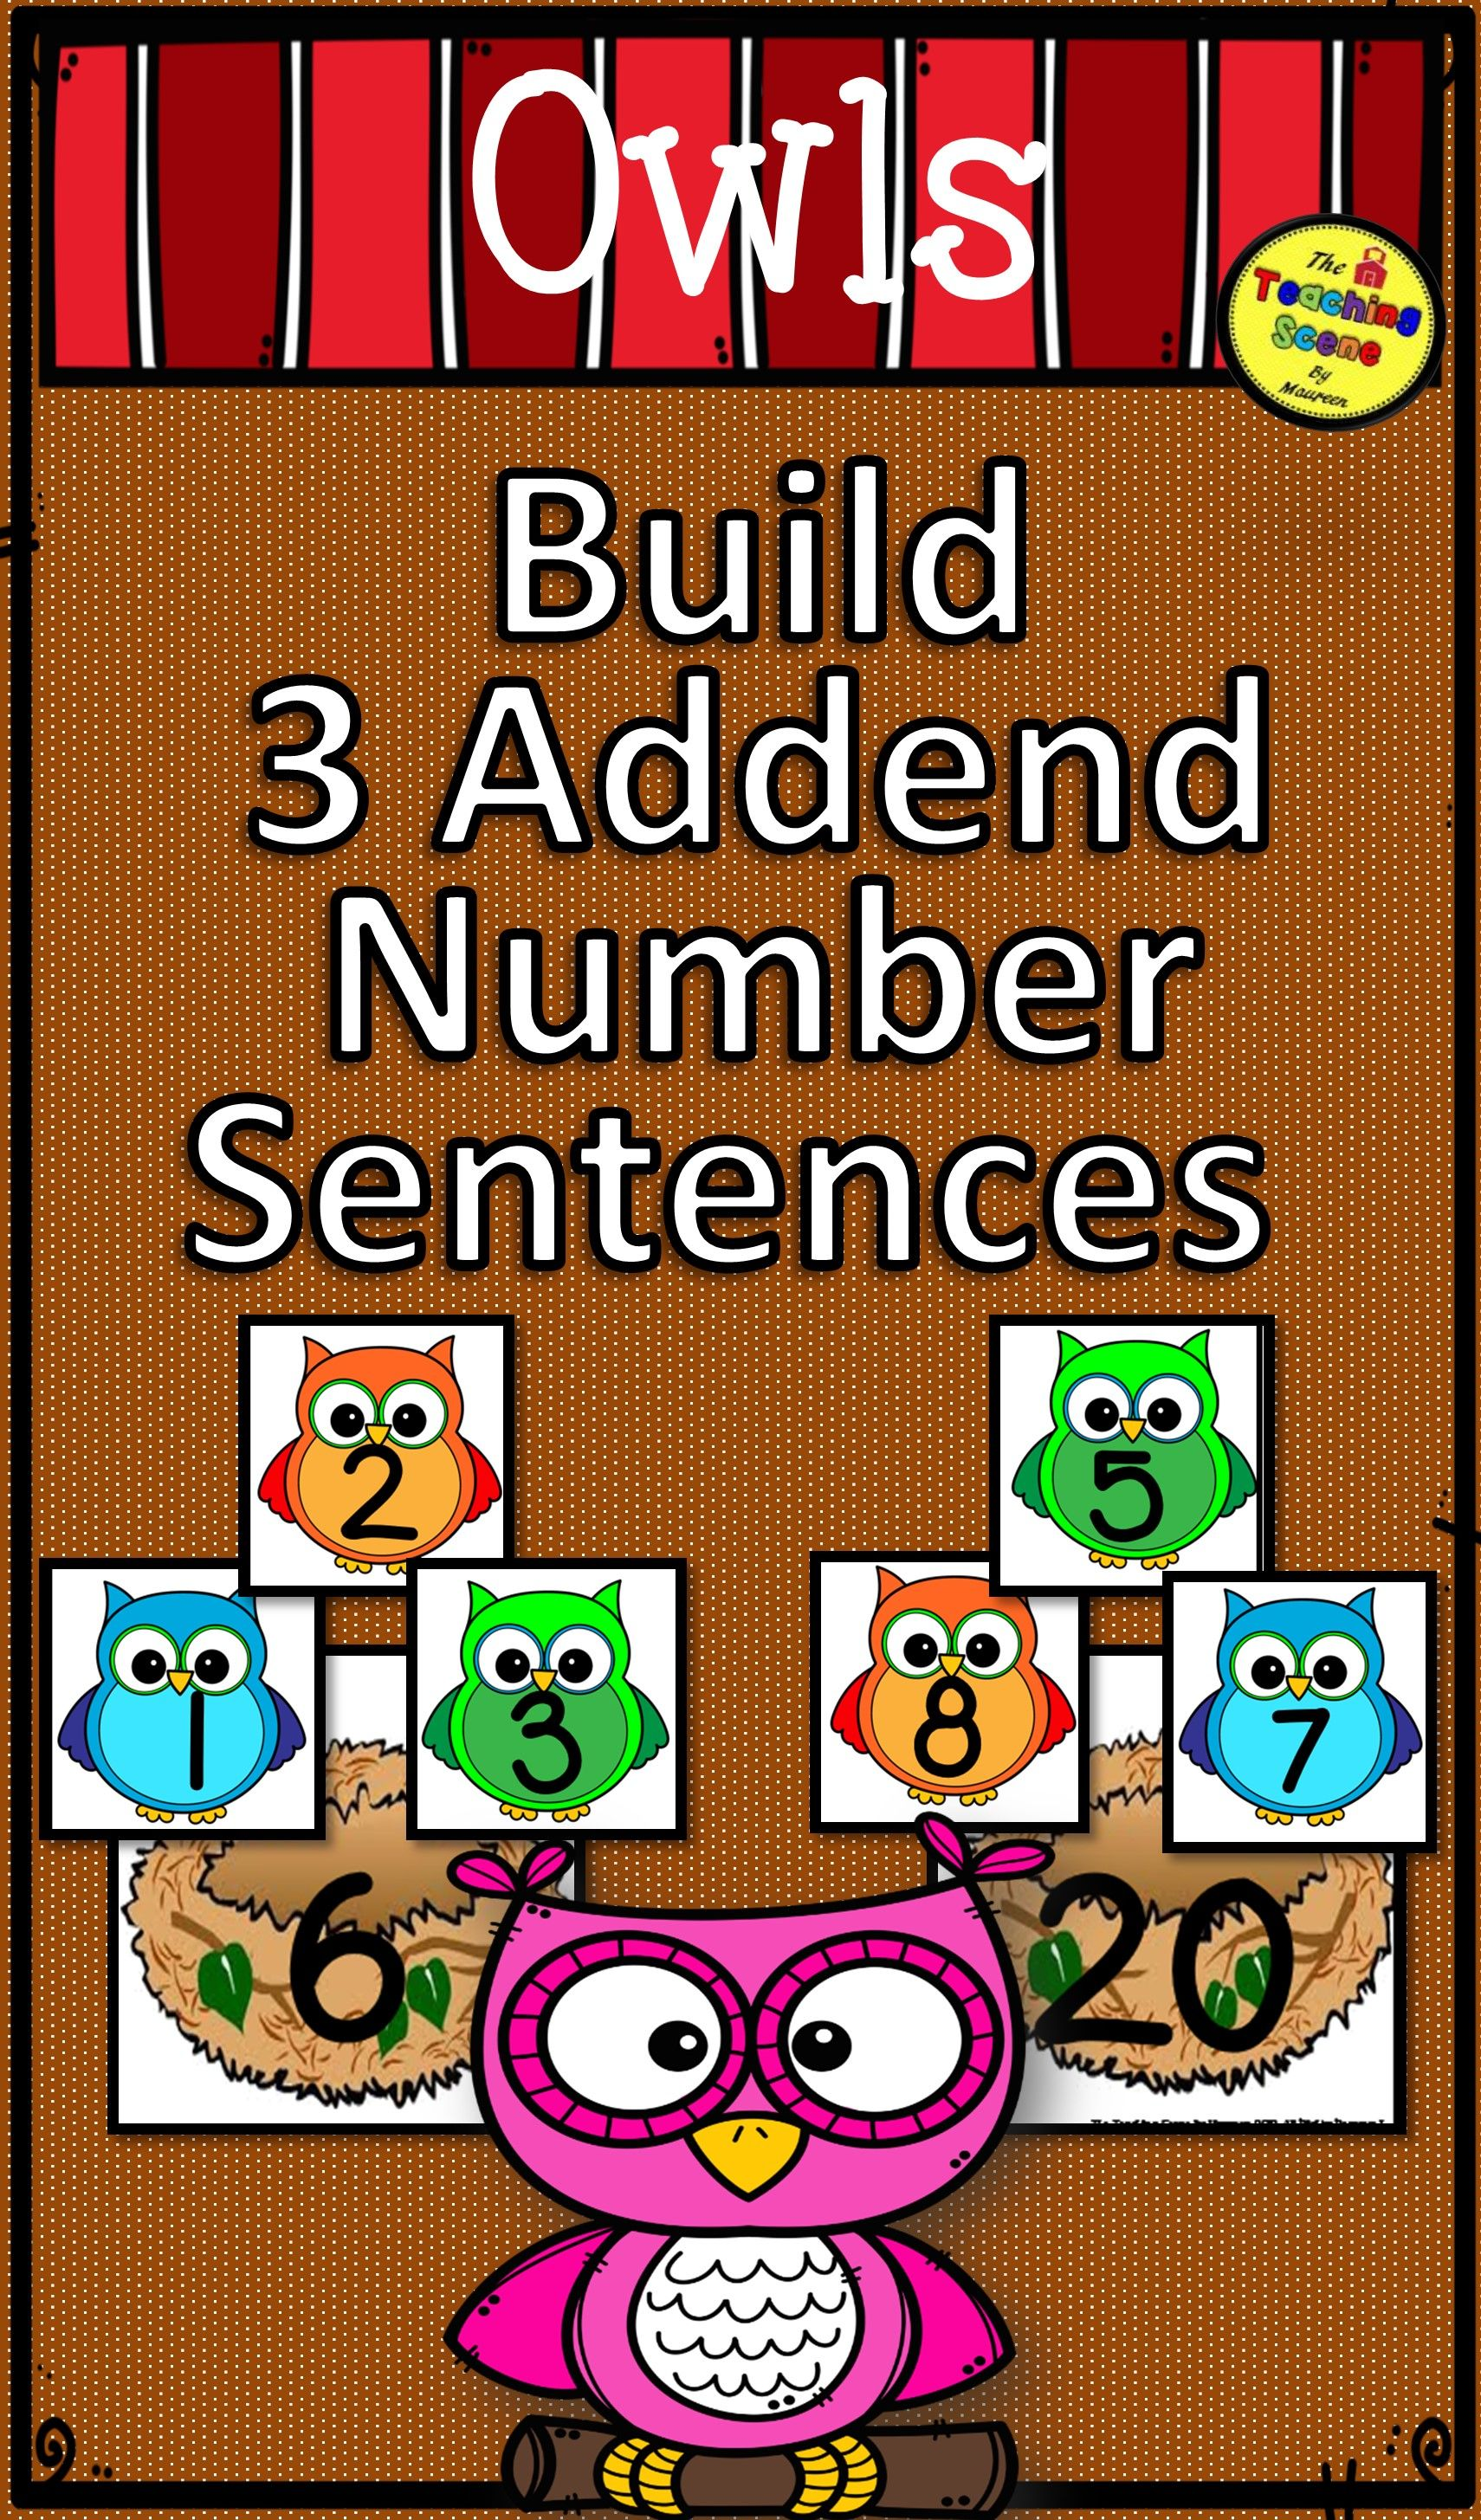 Owls Build 3 Addend Addition Amp Subtraction Number